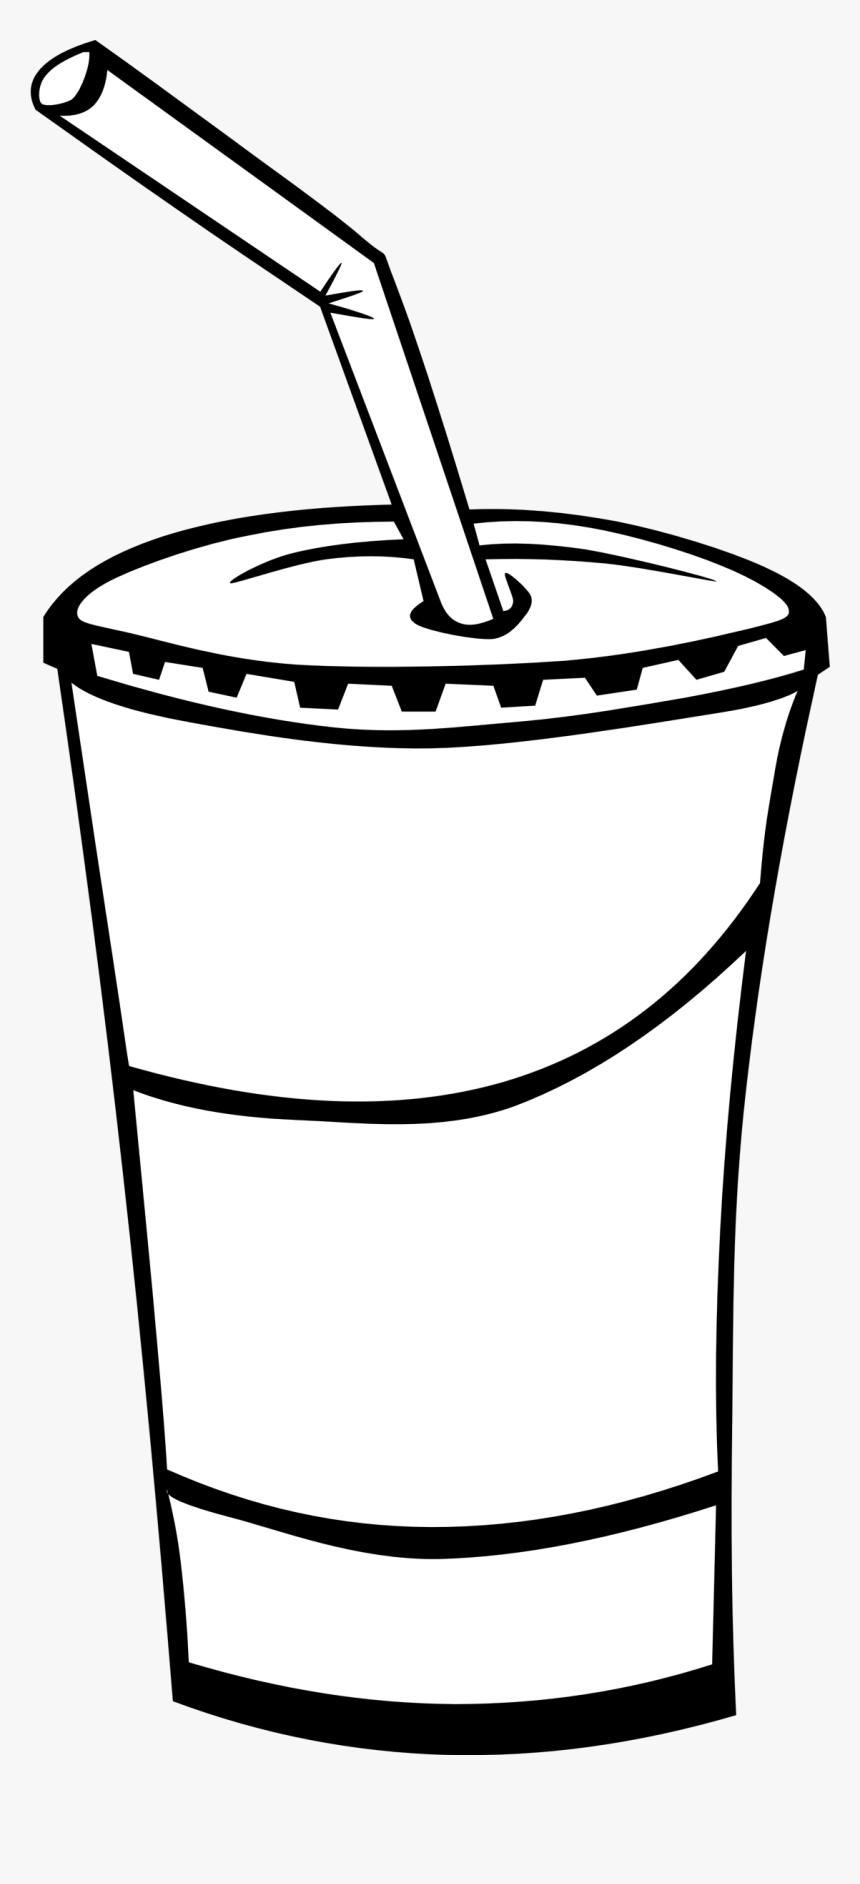 Purple Can Clip Art at Clker.com - vector clip art online, royalty free &  public domain